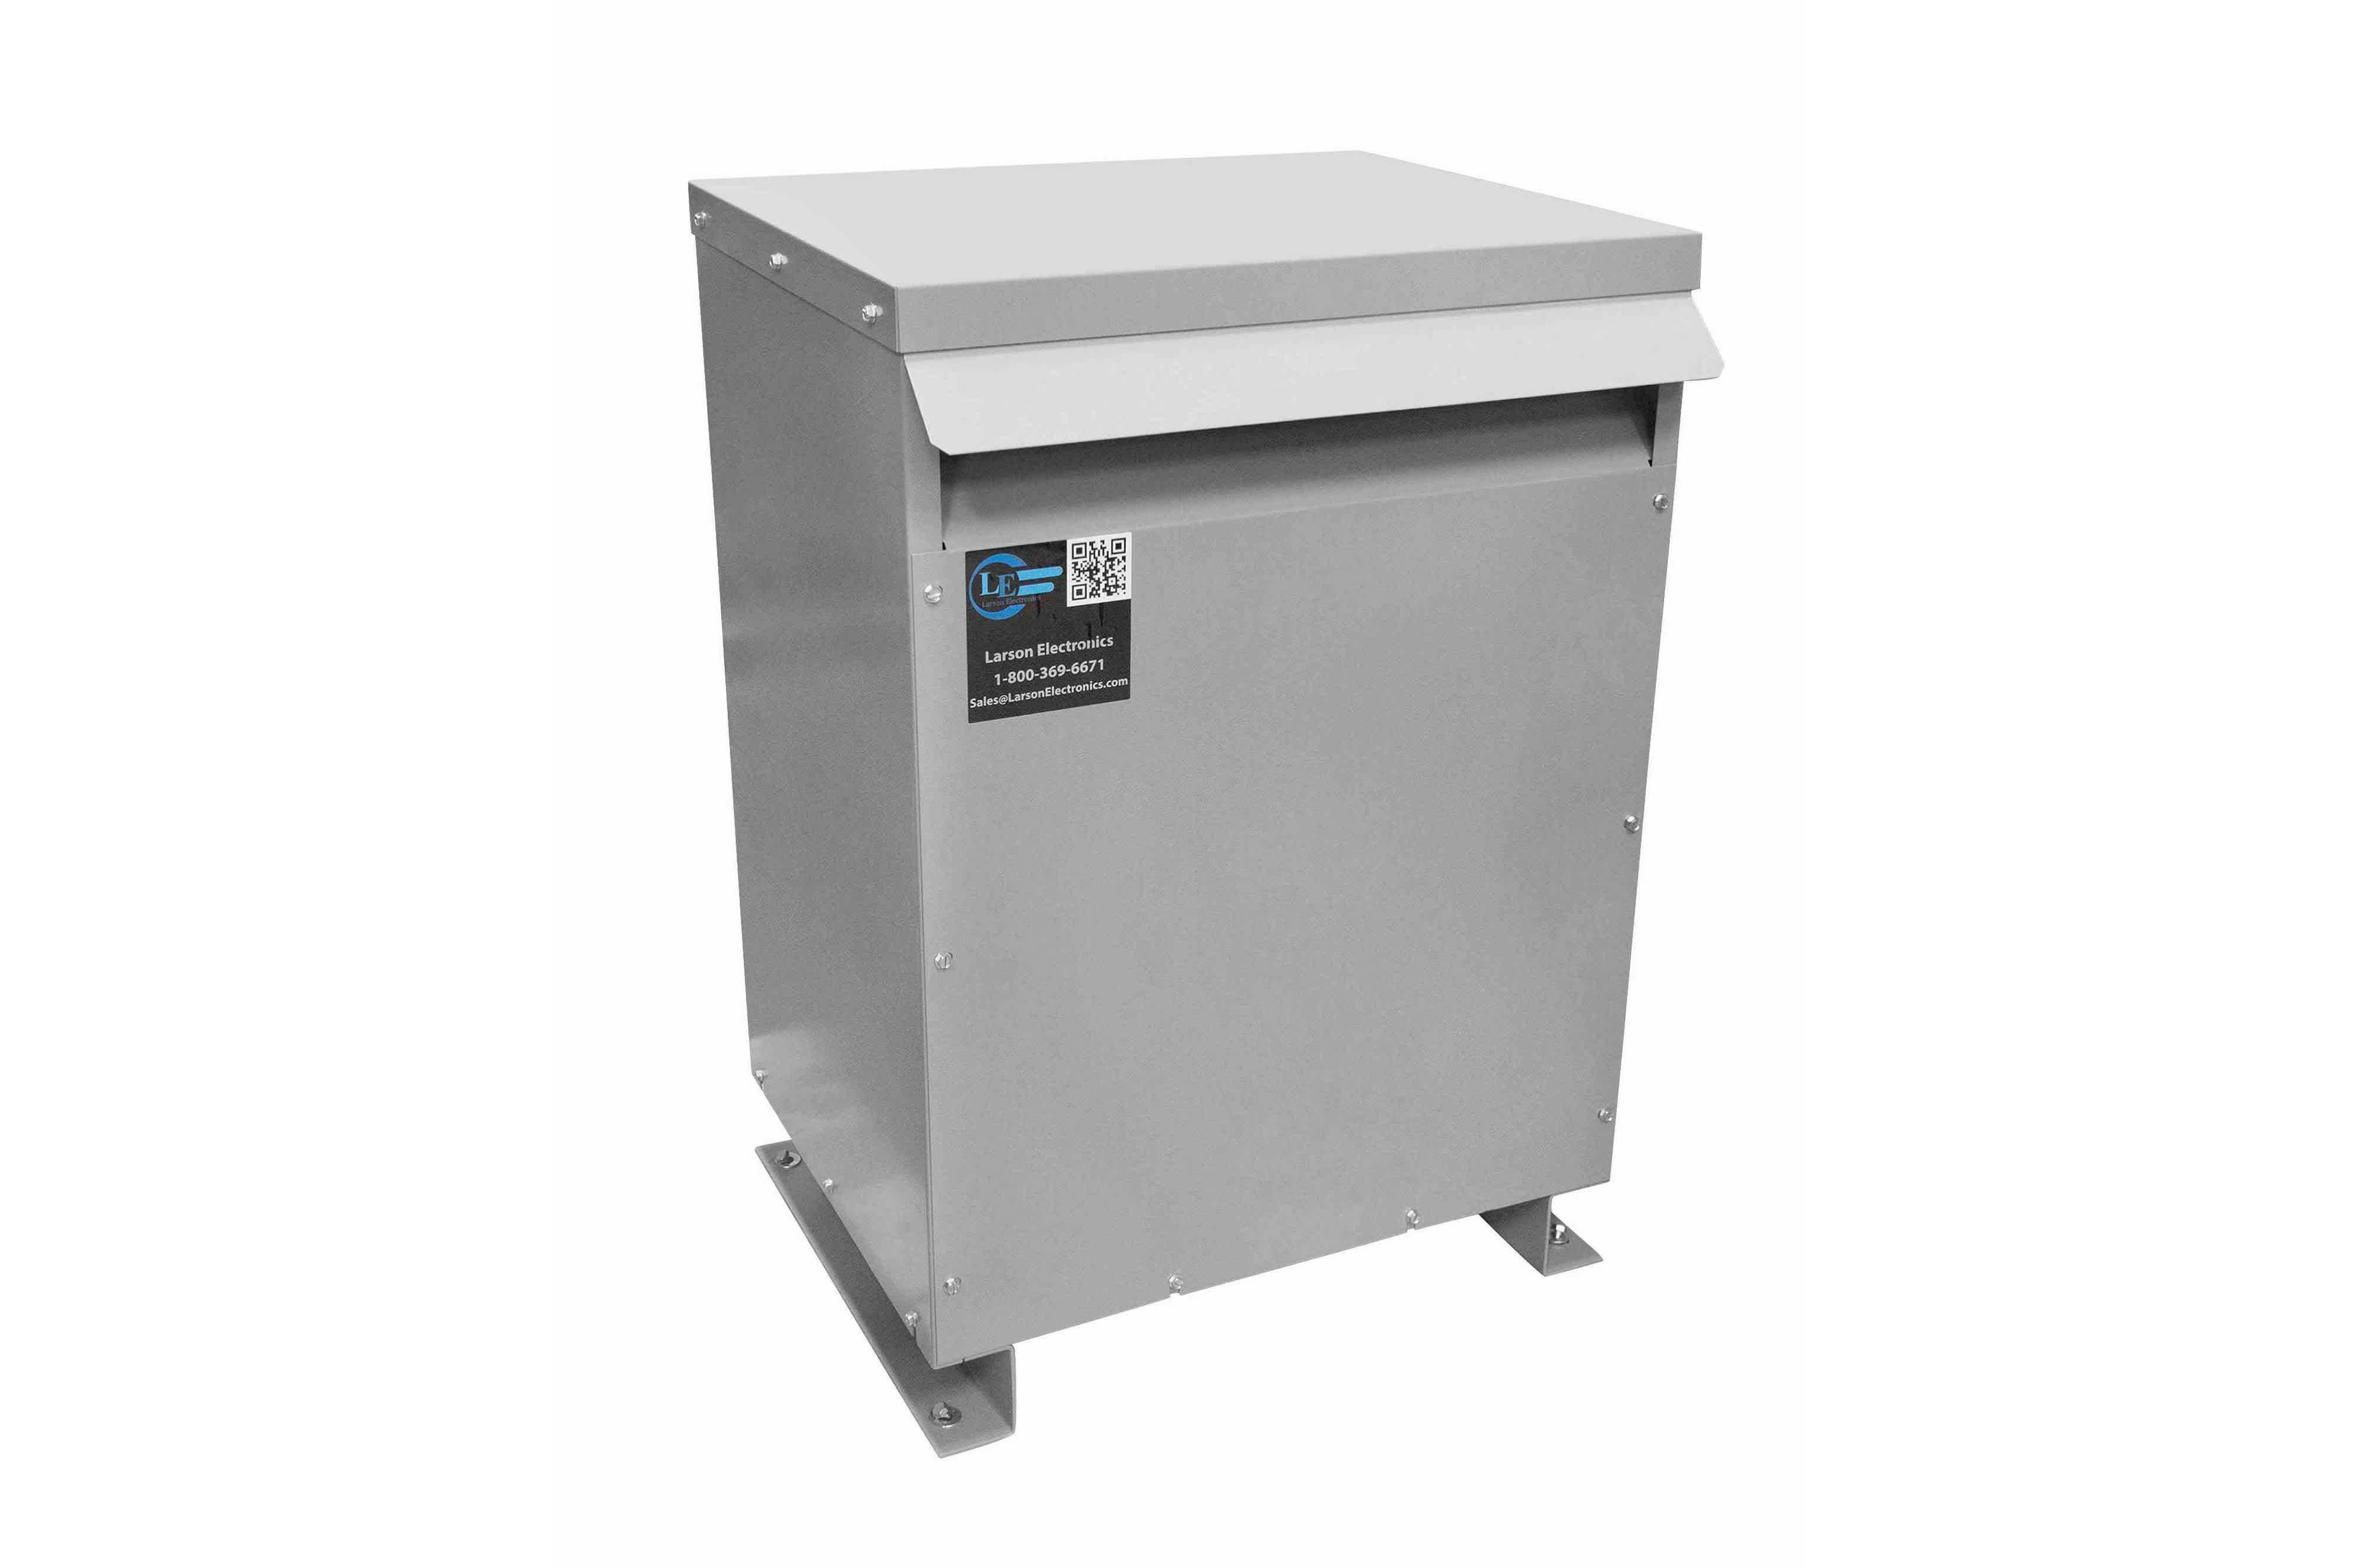 47.5 kVA 3PH Isolation Transformer, 400V Wye Primary, 480V Delta Secondary, N3R, Ventilated, 60 Hz